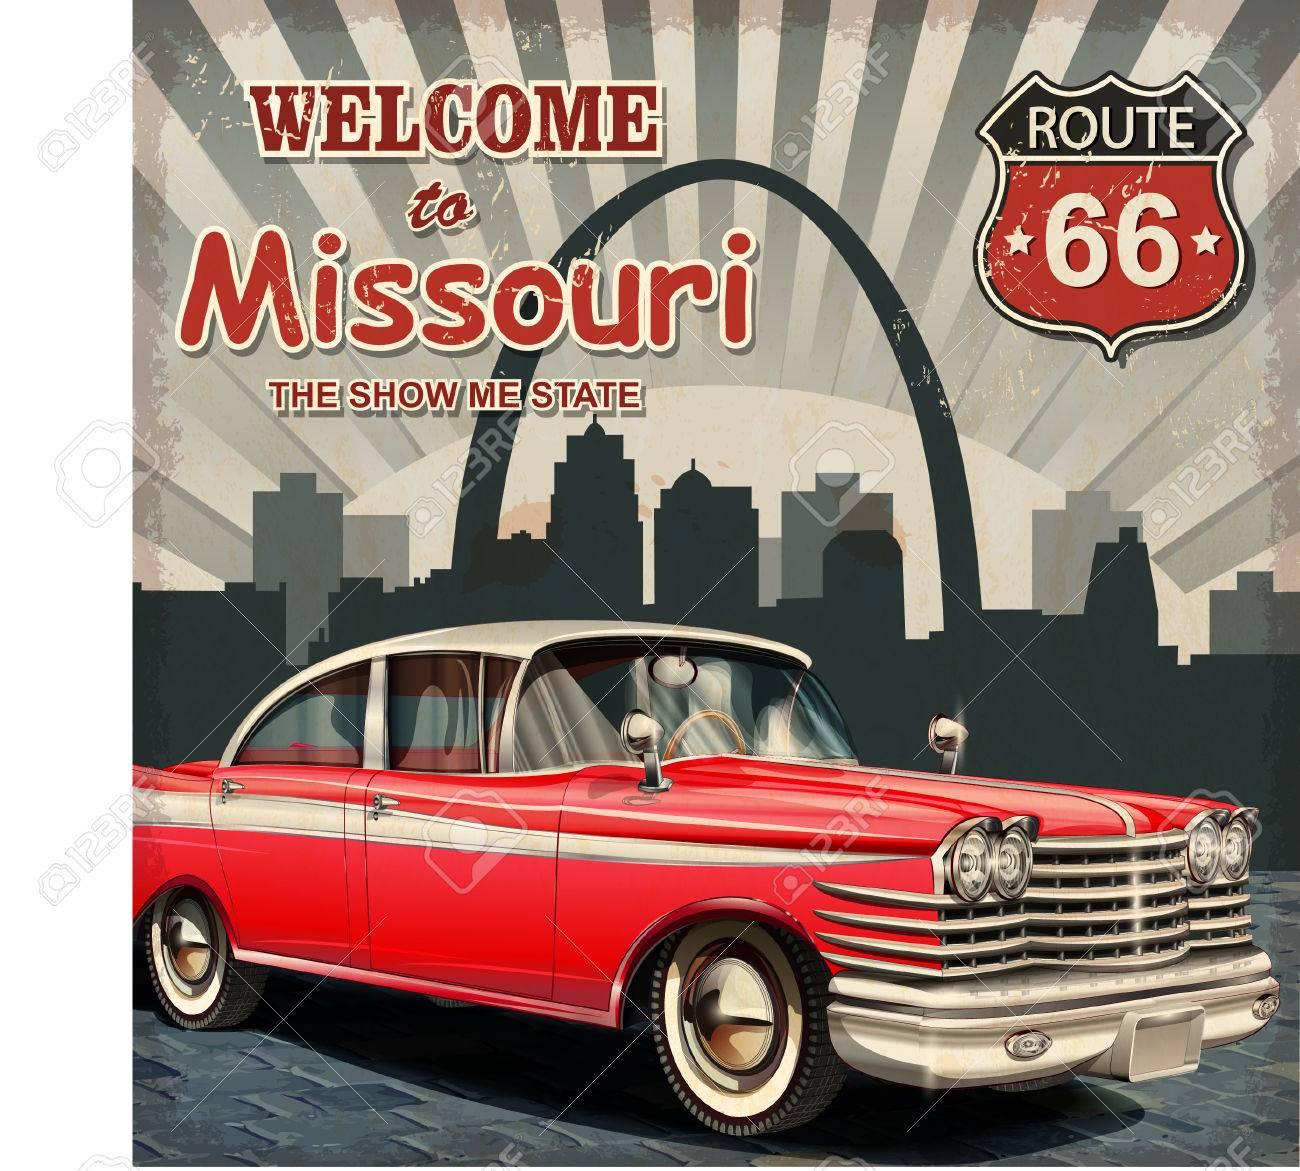 Welcome to Missouri retro poster. - 50494400